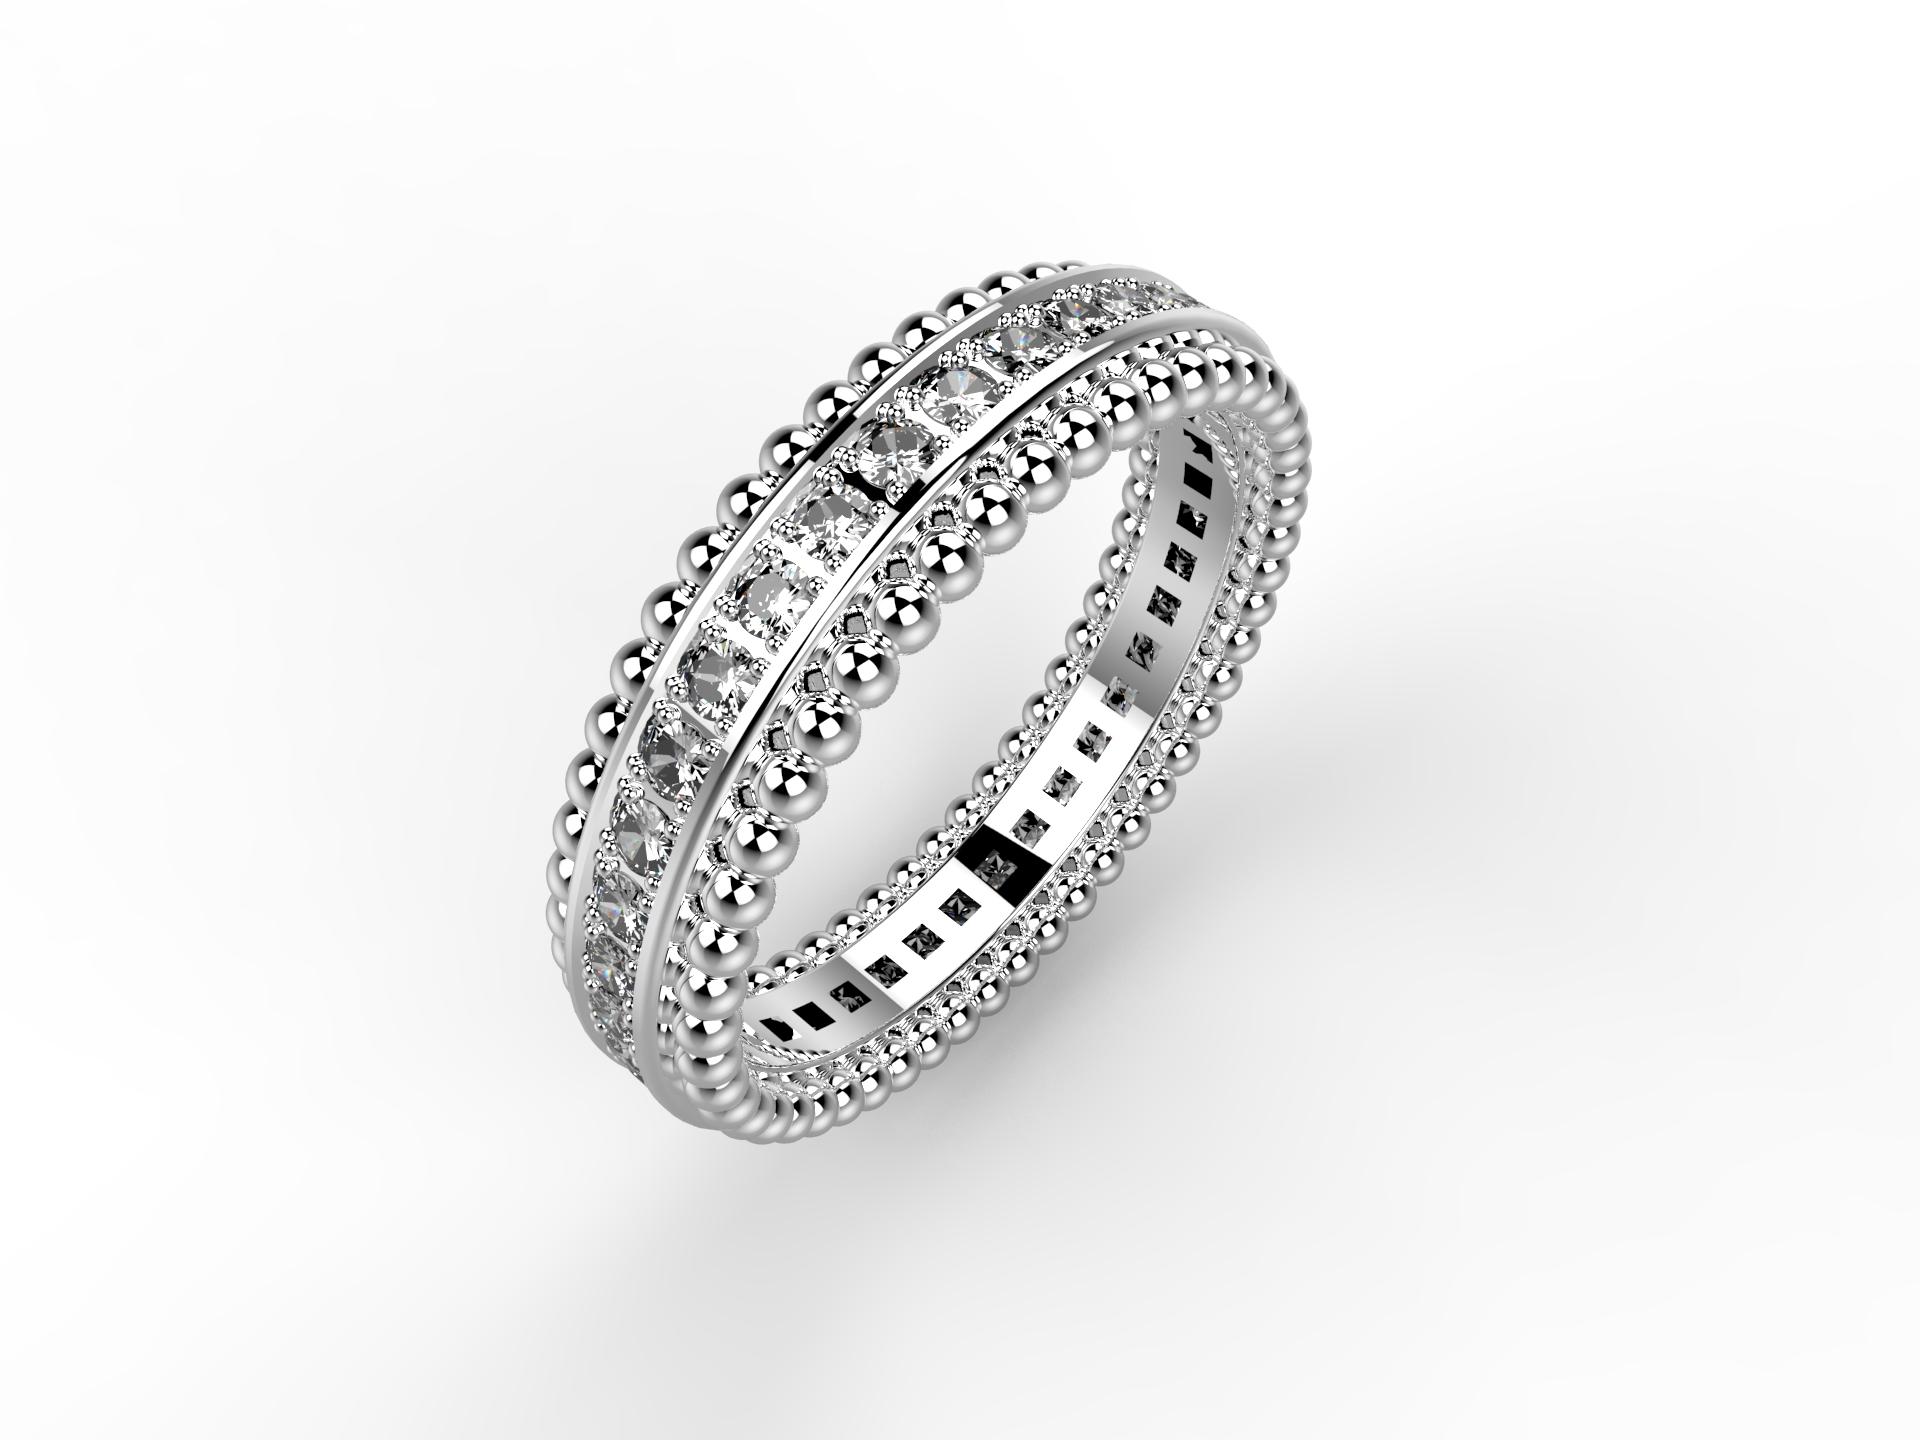 Alliance or blanc et diamants 2140 €